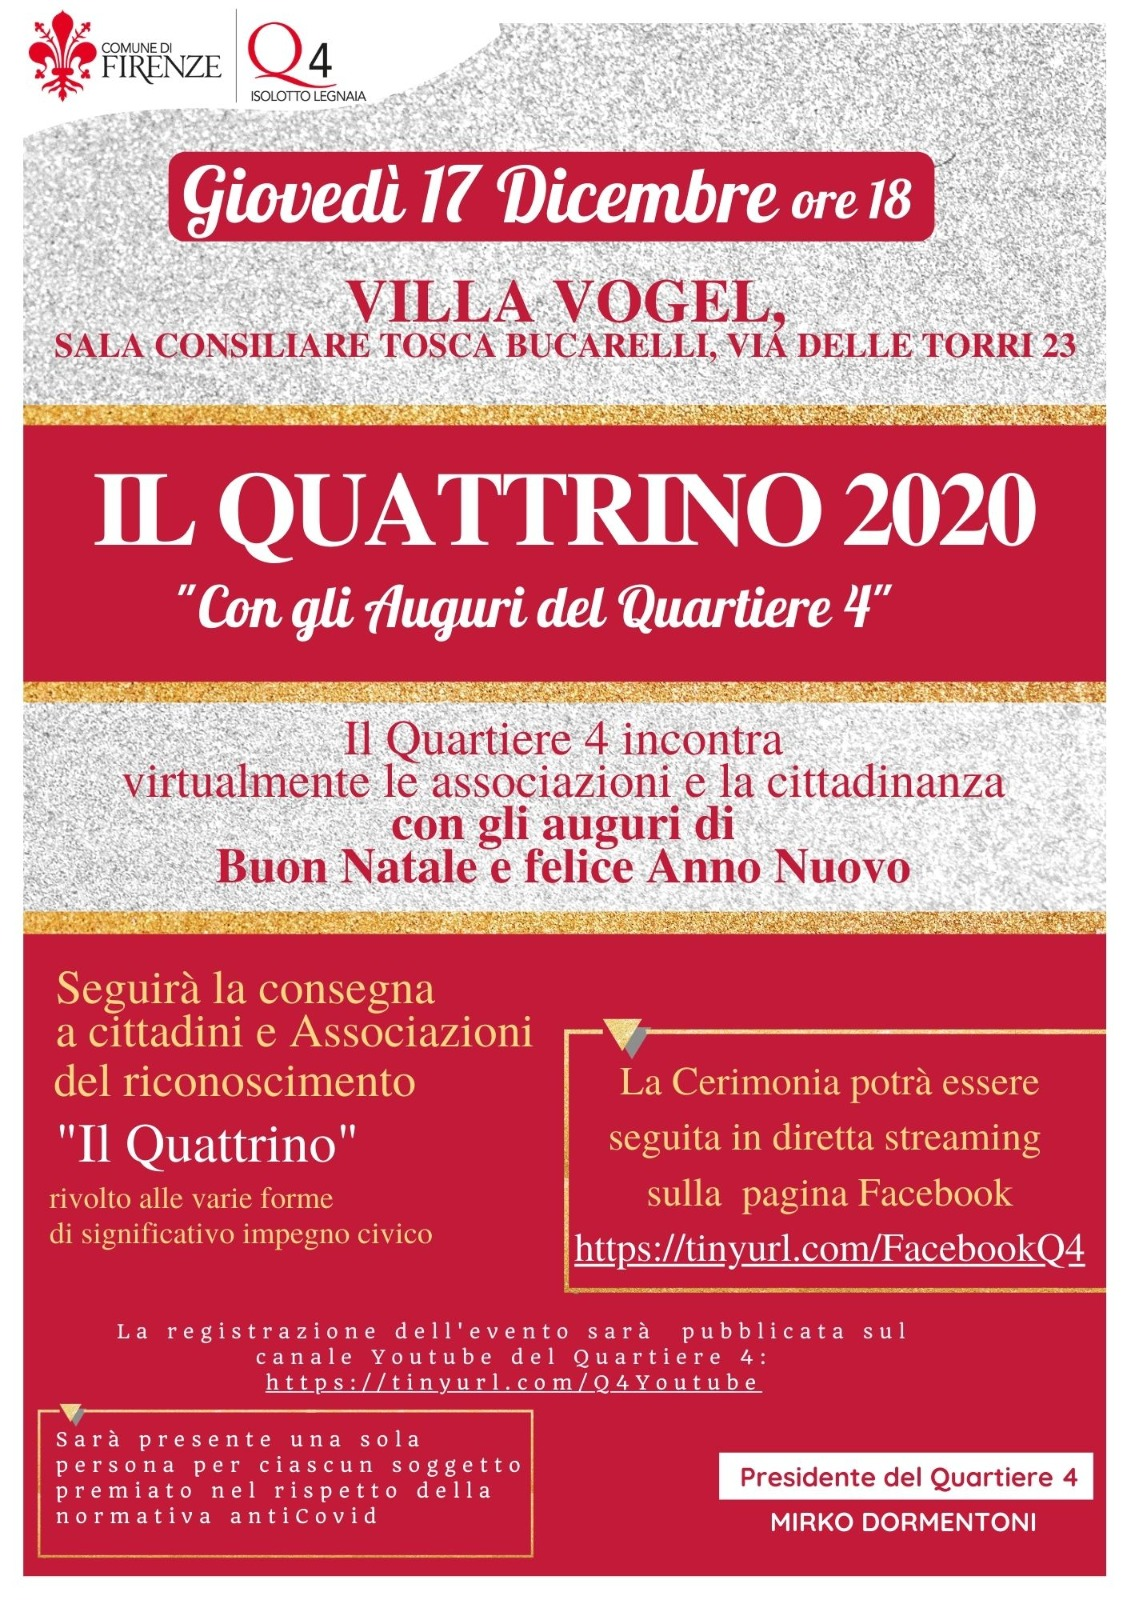 locandina quattrino 2020